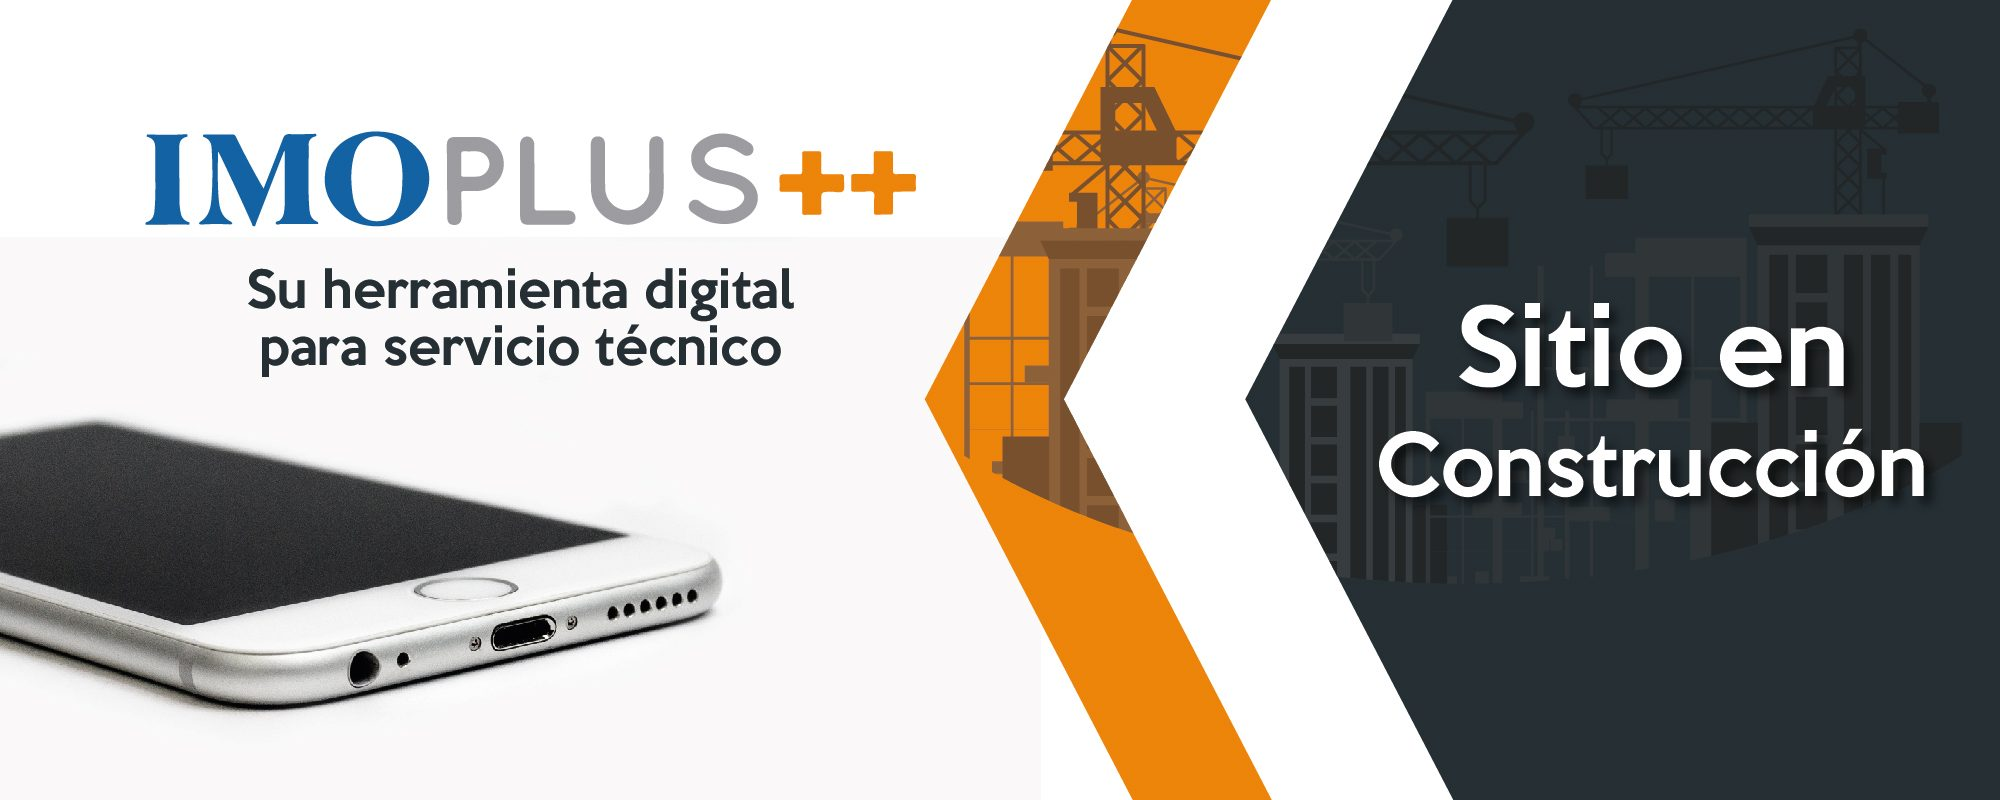 Imoplus++ herramienta de servicio tecnico